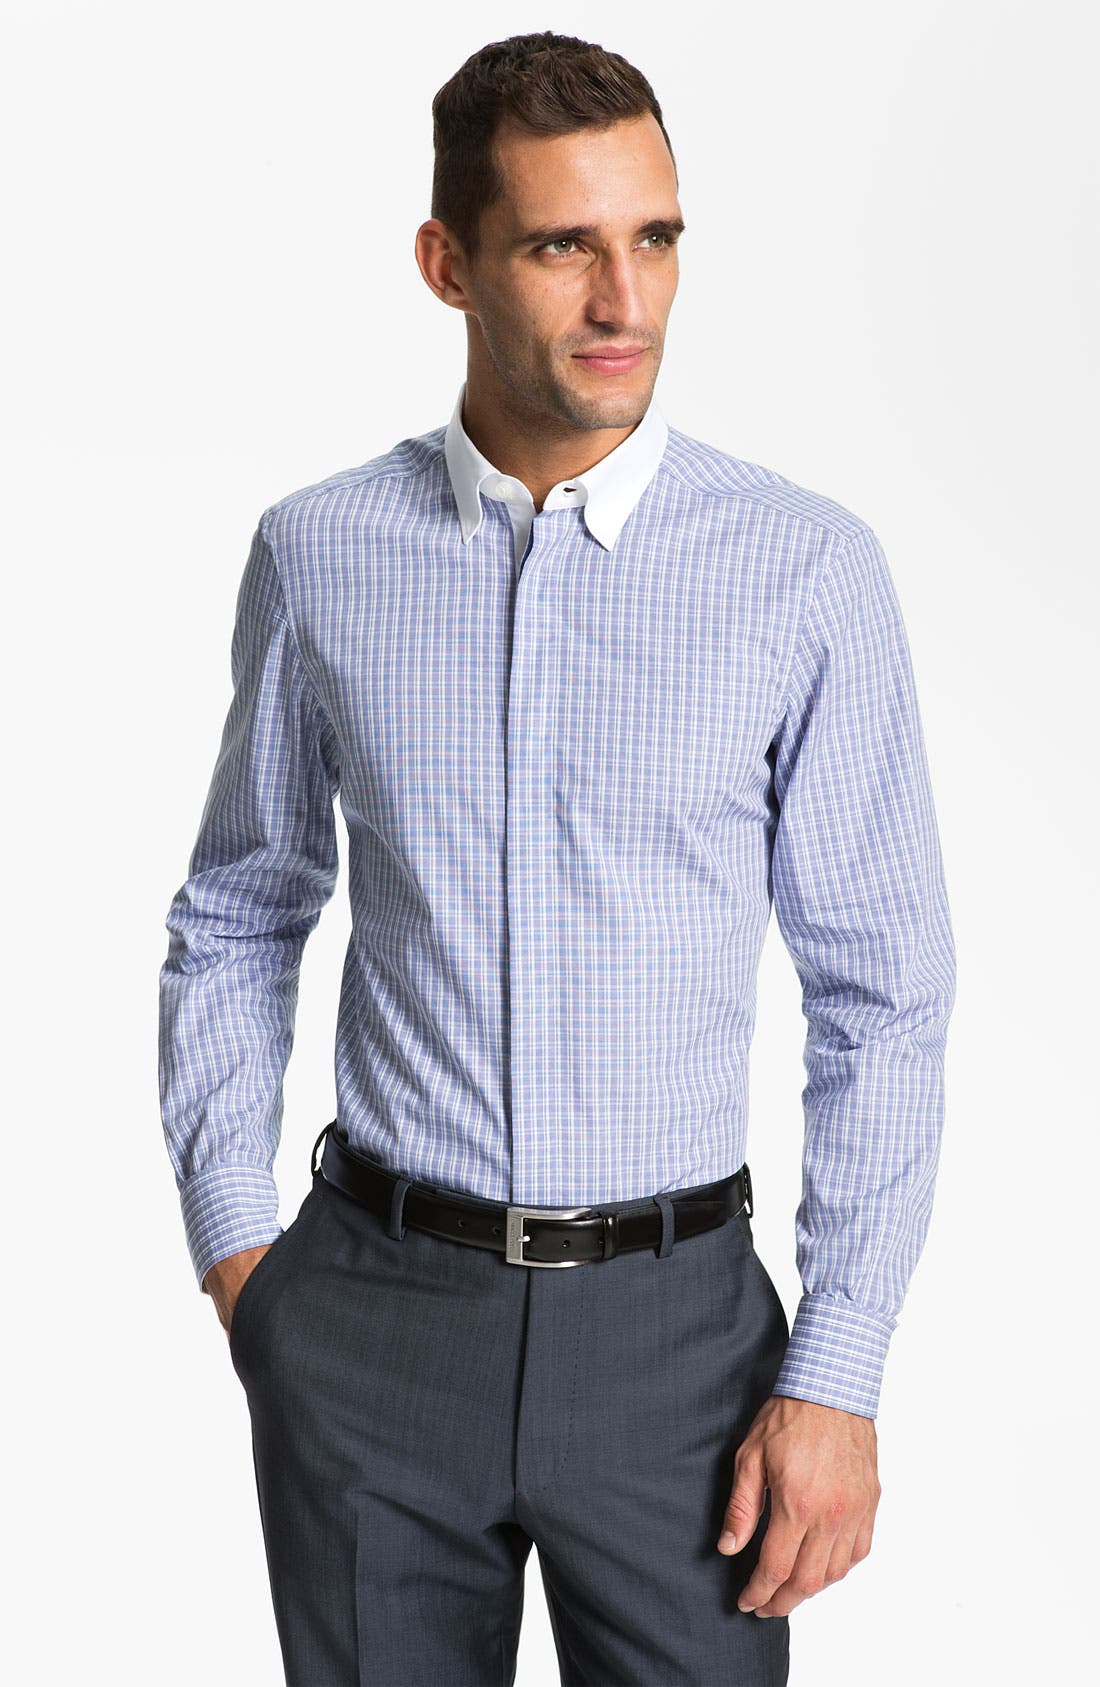 Alternate Image 1 Selected - Z Zegna Trim Fit Dress Shirt